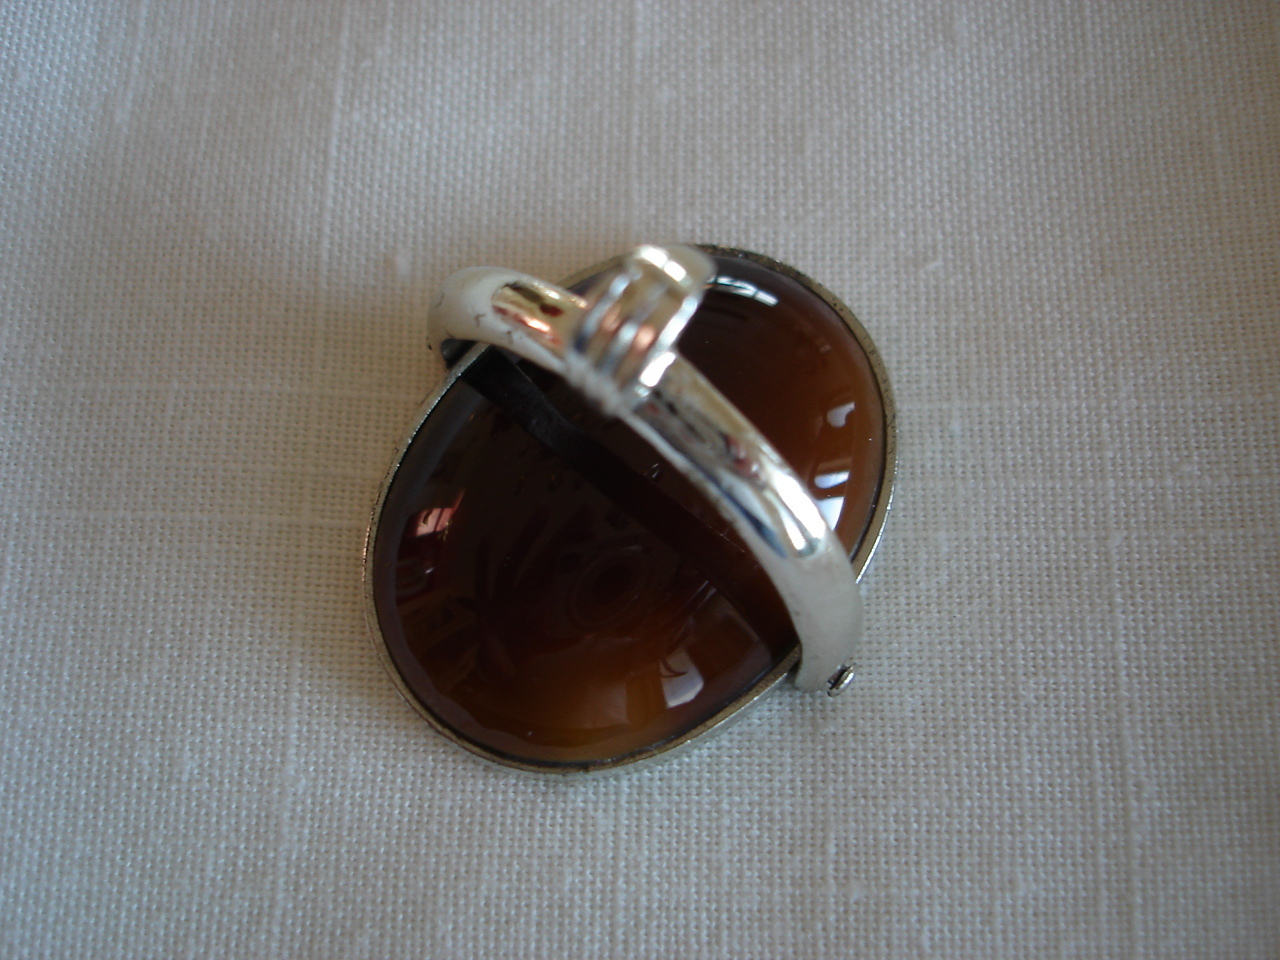 Vintage Silvertone Frame, Topaz Glass Stone Pendant, Mirror Back, Swivels